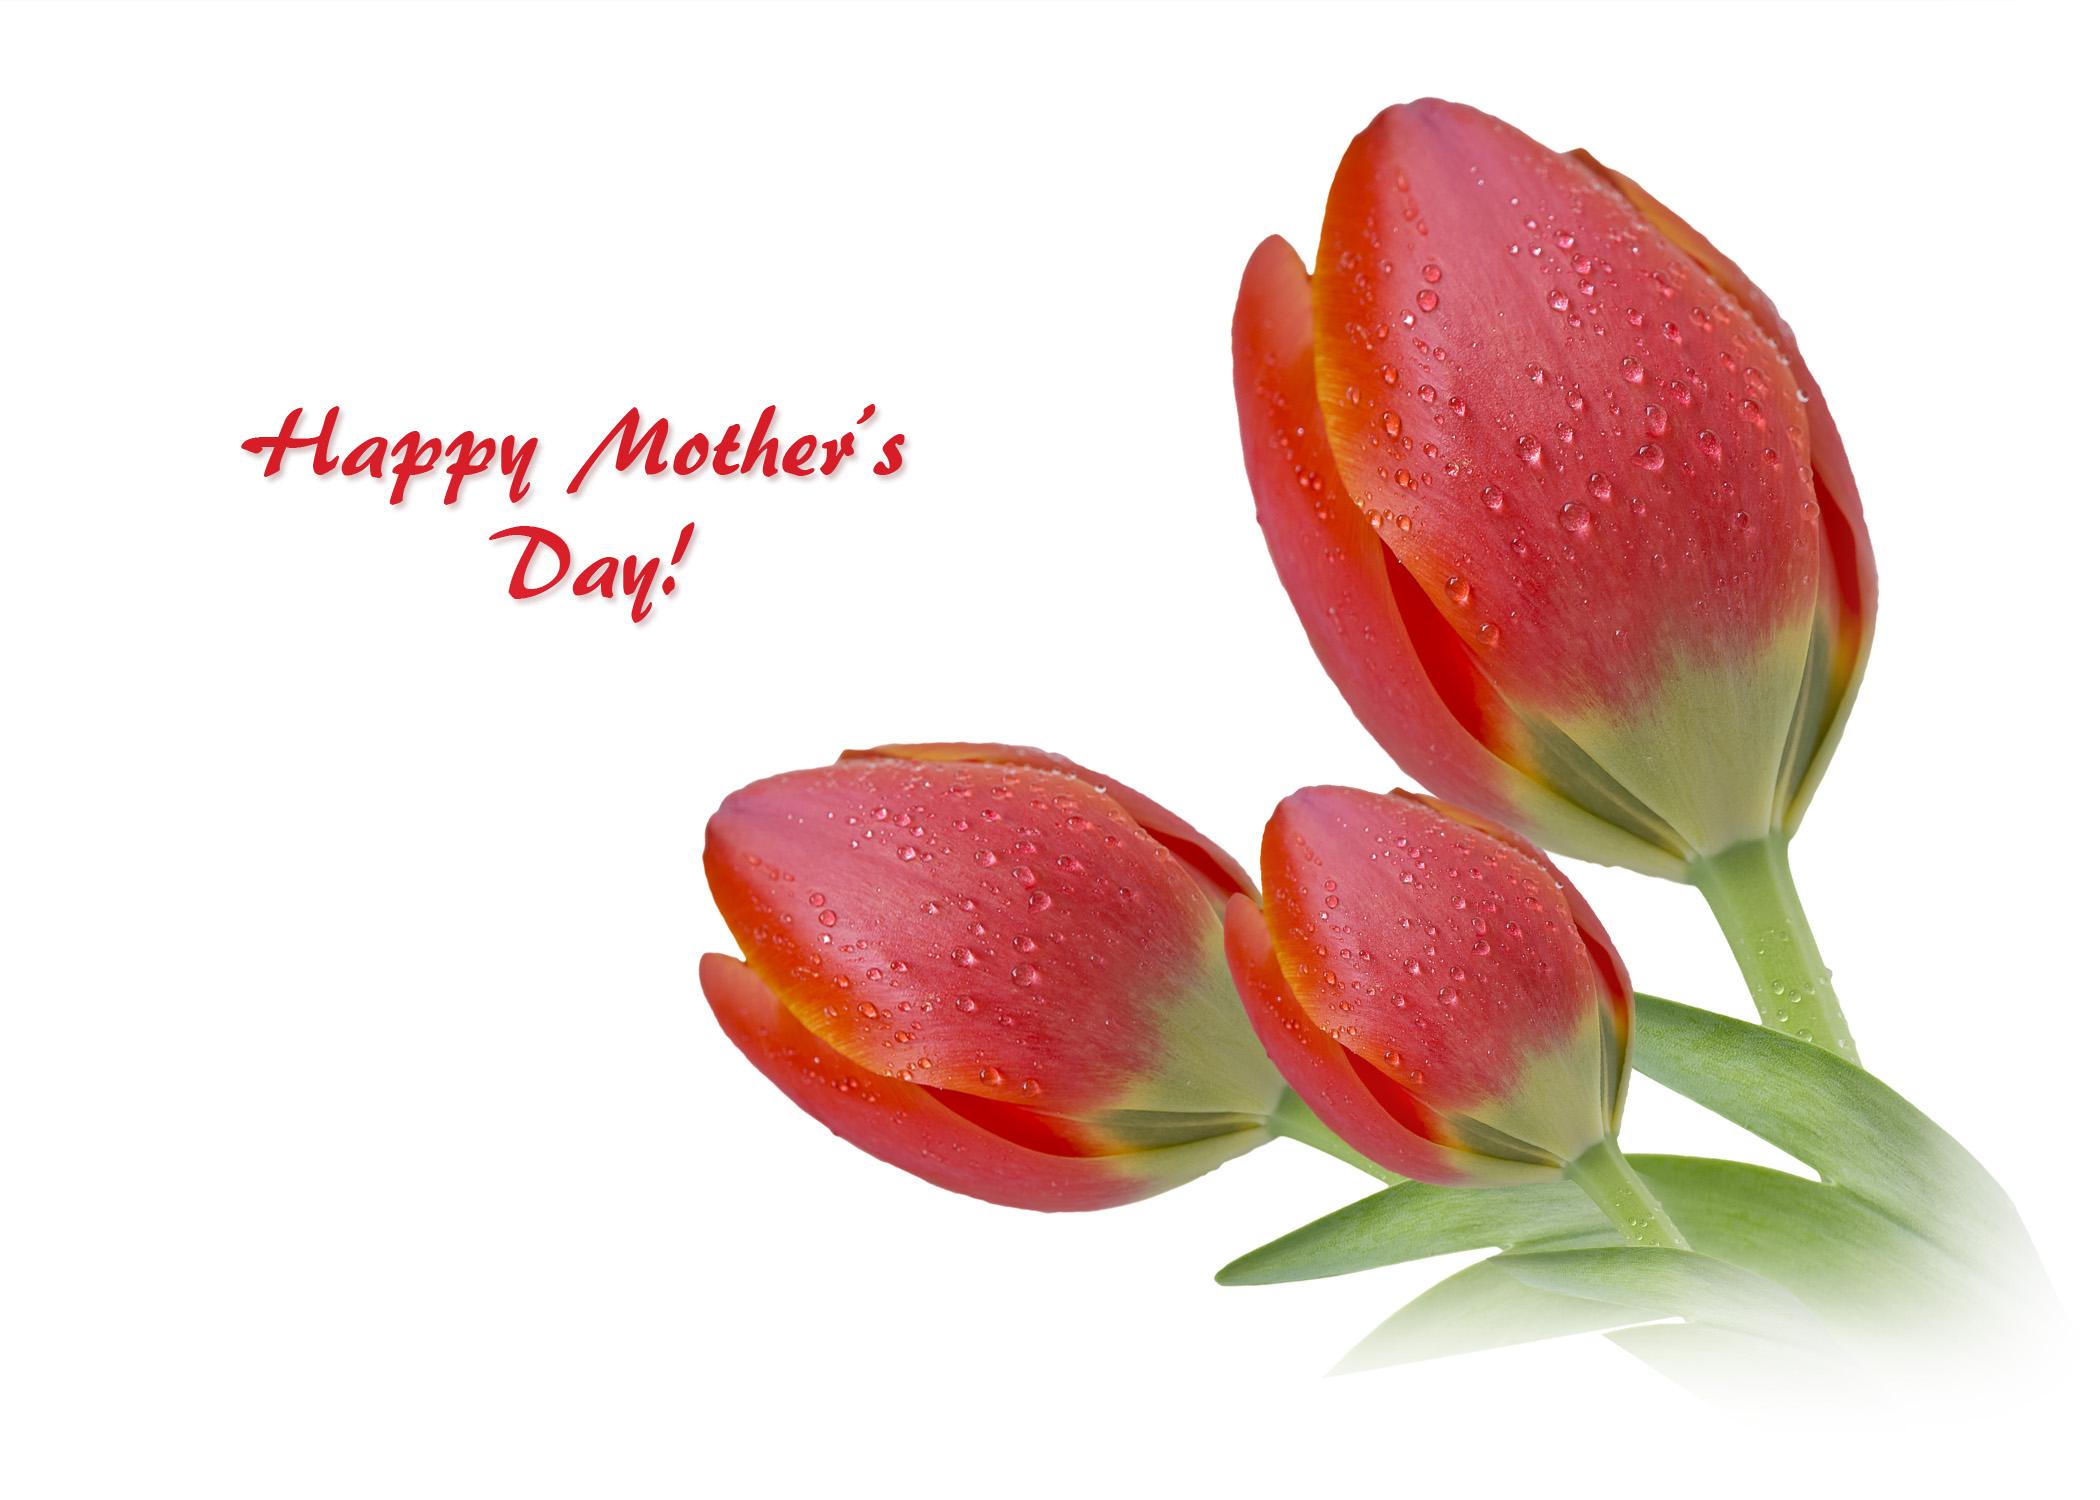 HappyMothersDay_tulips.jpg